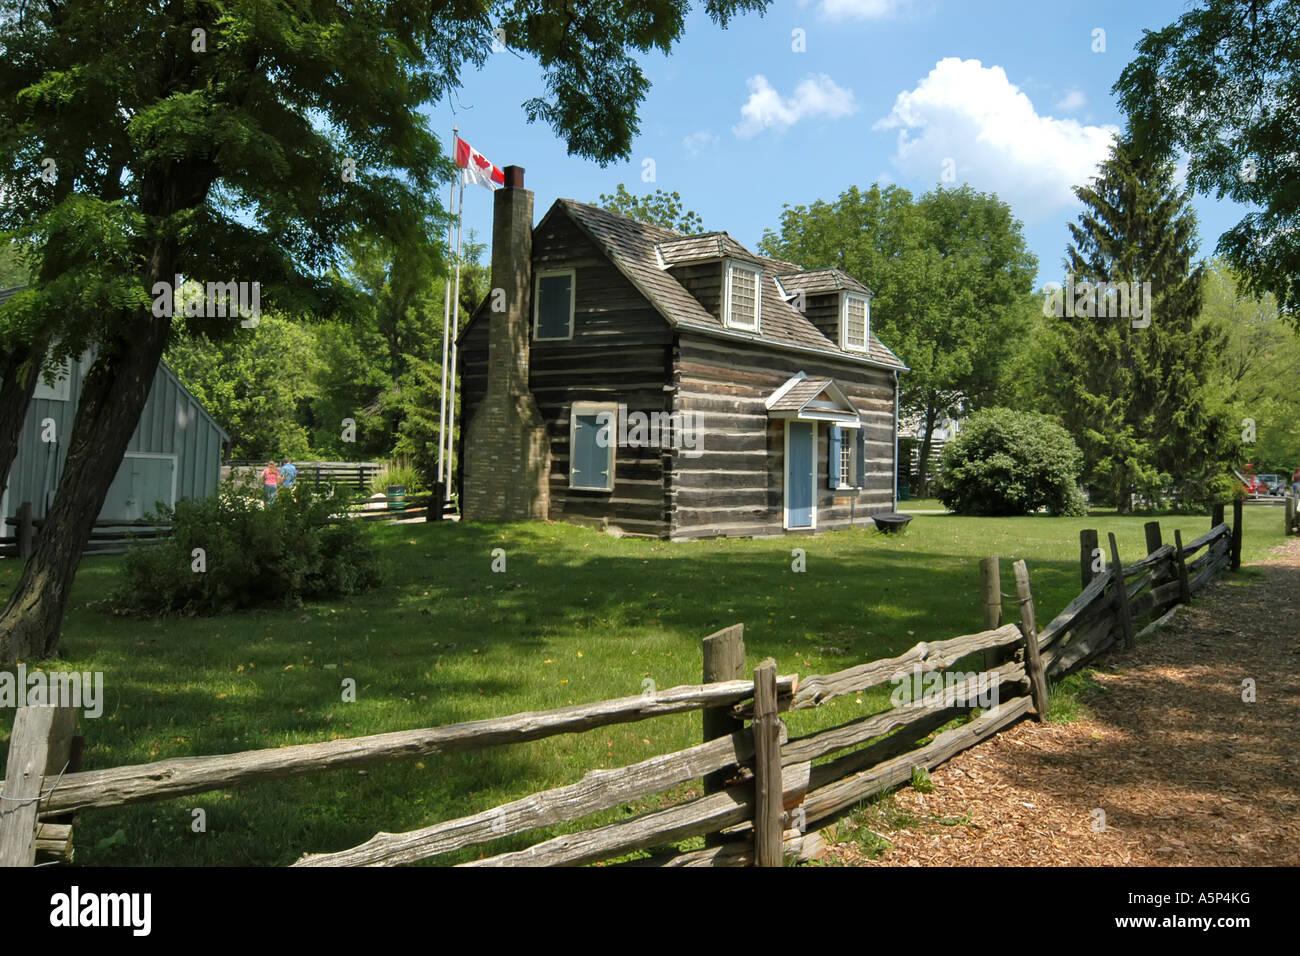 American pioneers house dating from 1850 on a rural for Rural housing utah